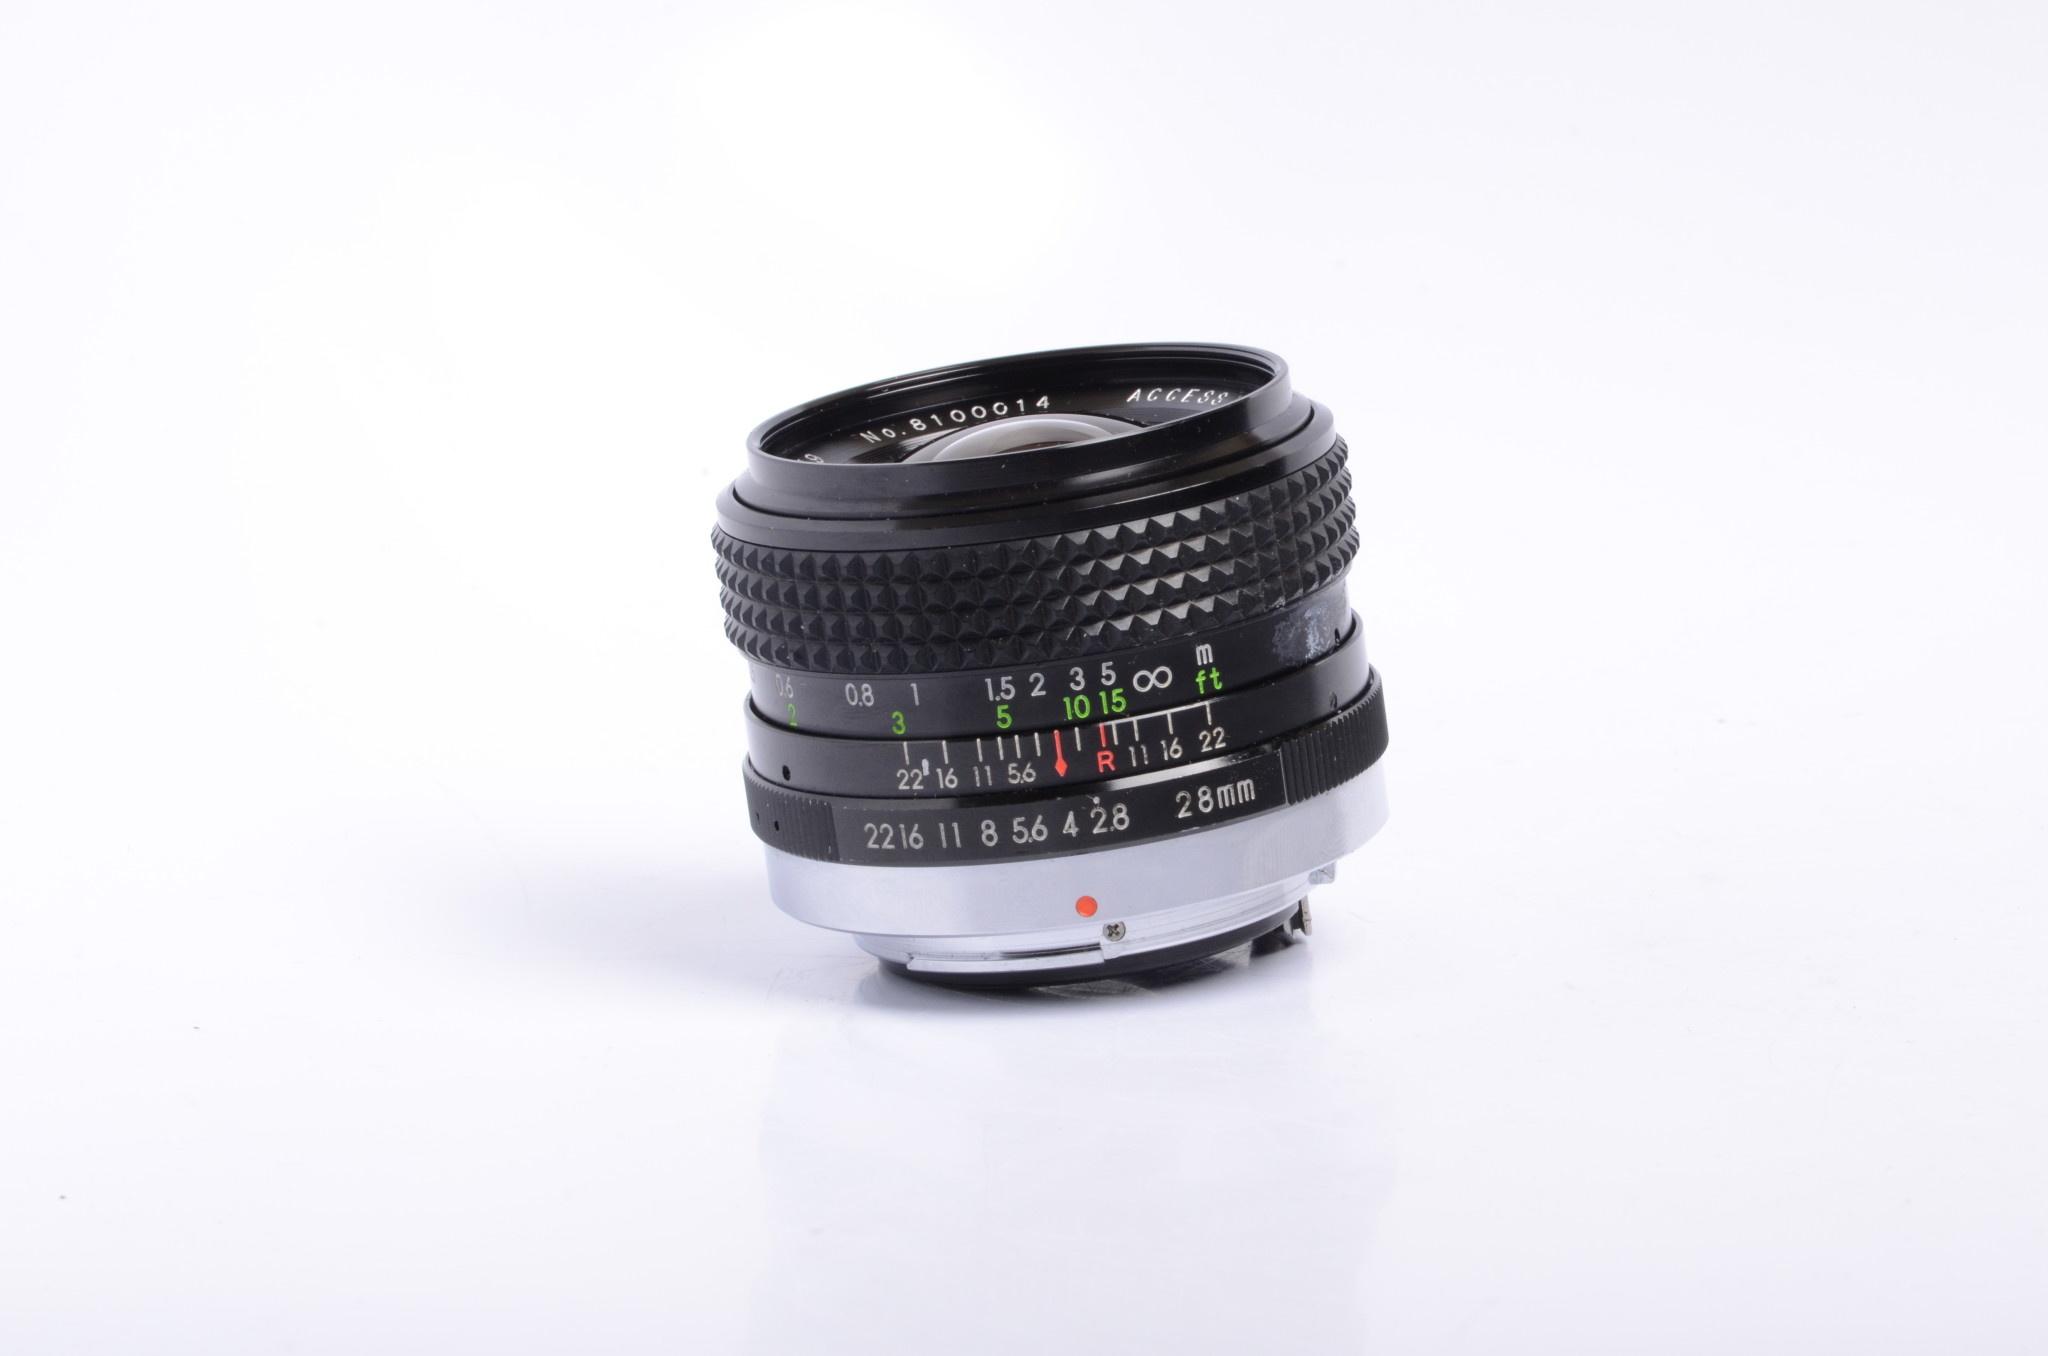 Access P-MC 28mm f/2.8 SN: 8100014